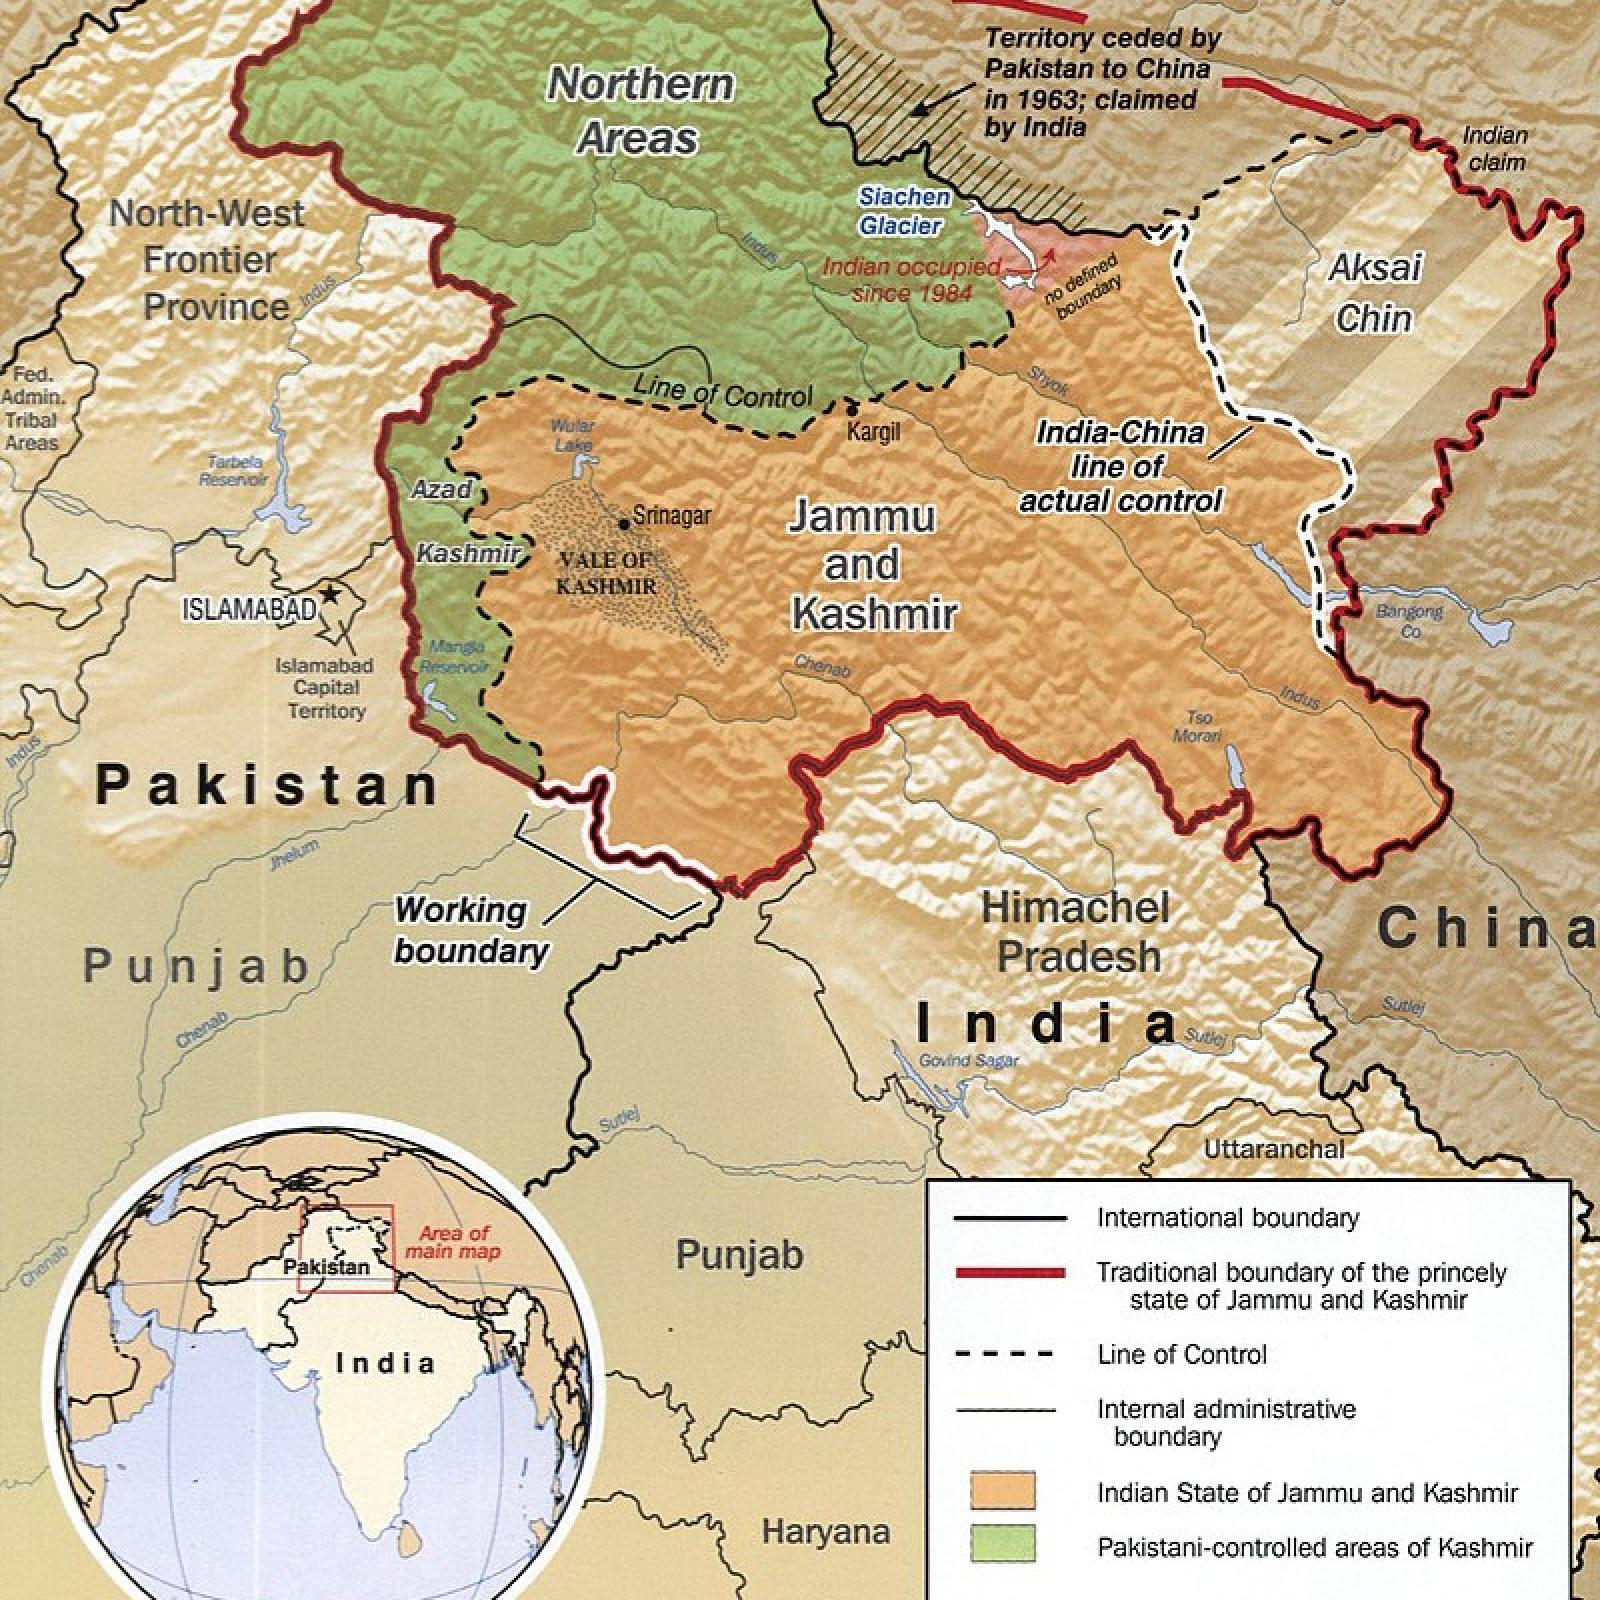 China and Pakistan Warn India After 'Unacceptable' Border